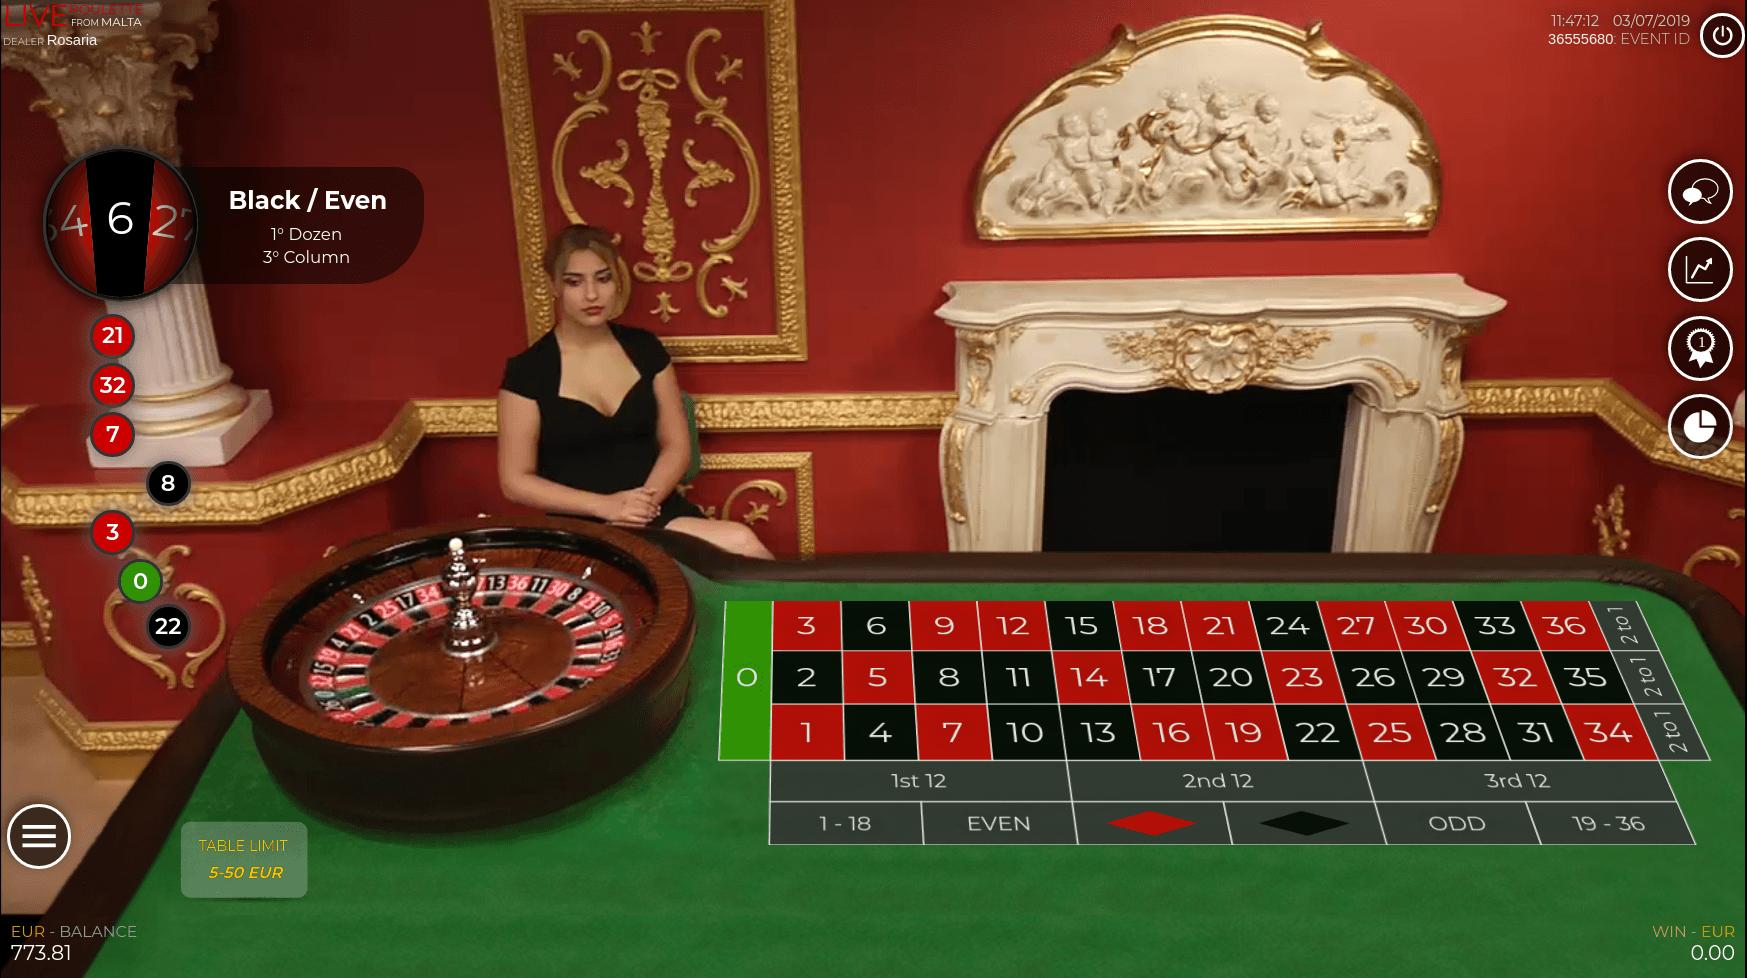 Casinos foxium português 22599